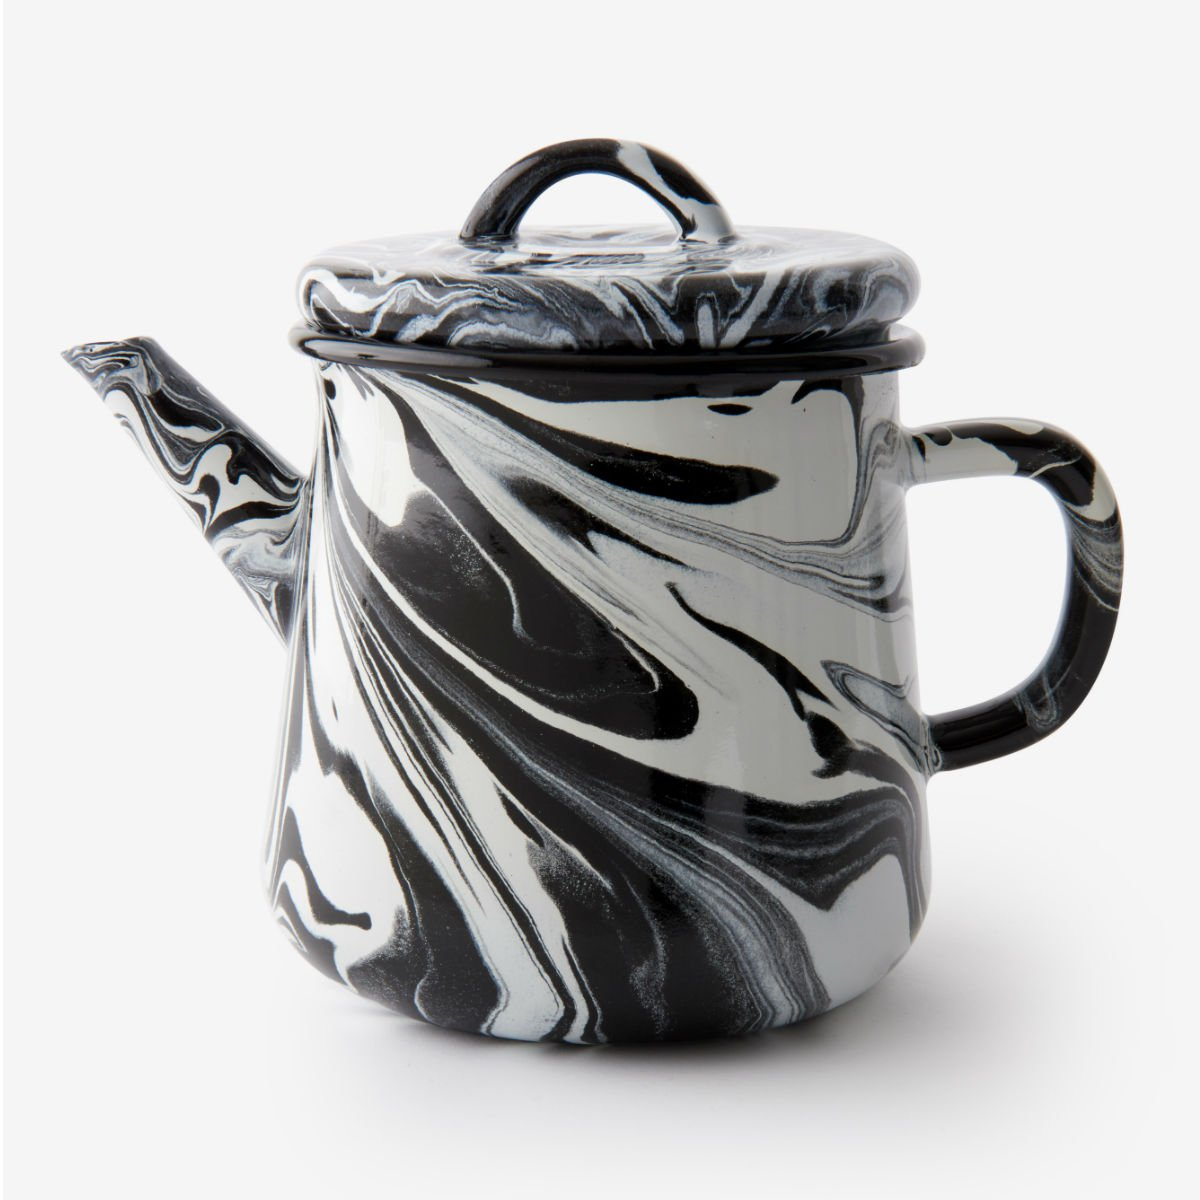 Černá smaltovaná čajová konvice